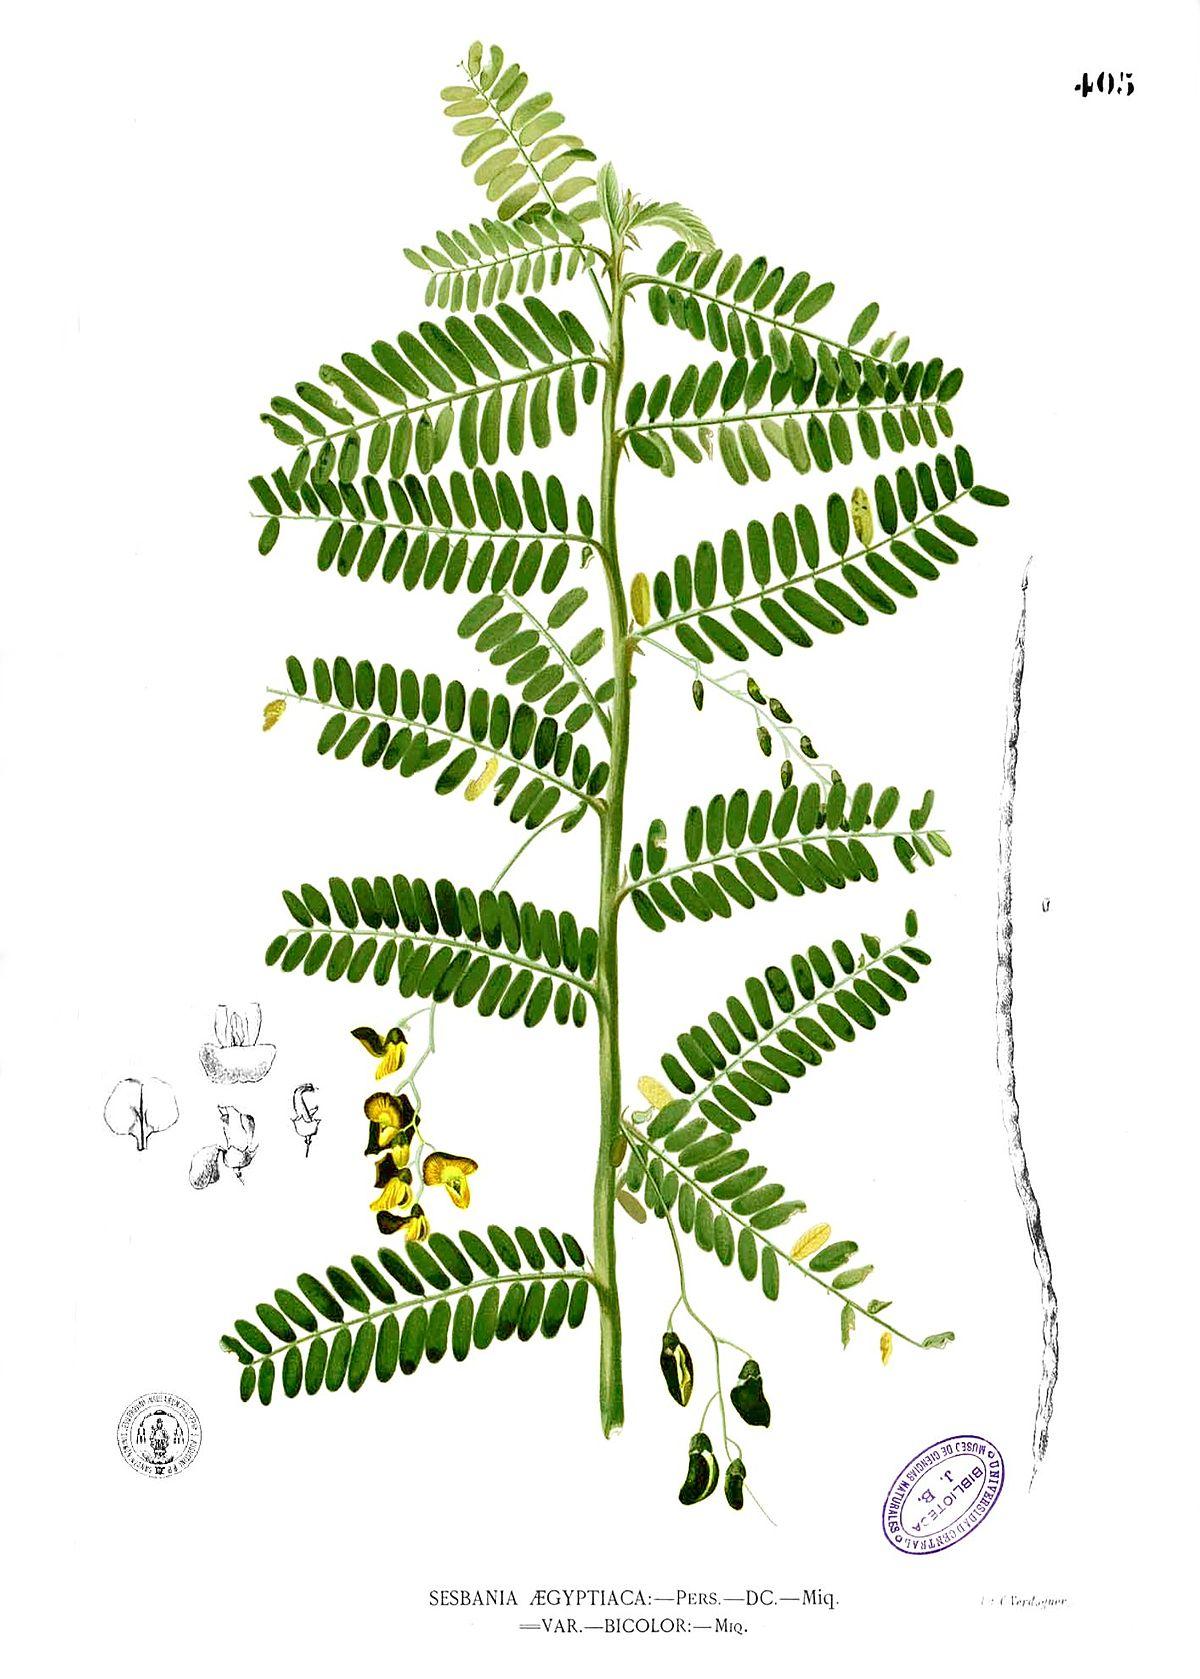 Sesbania sesban - Wikipedia